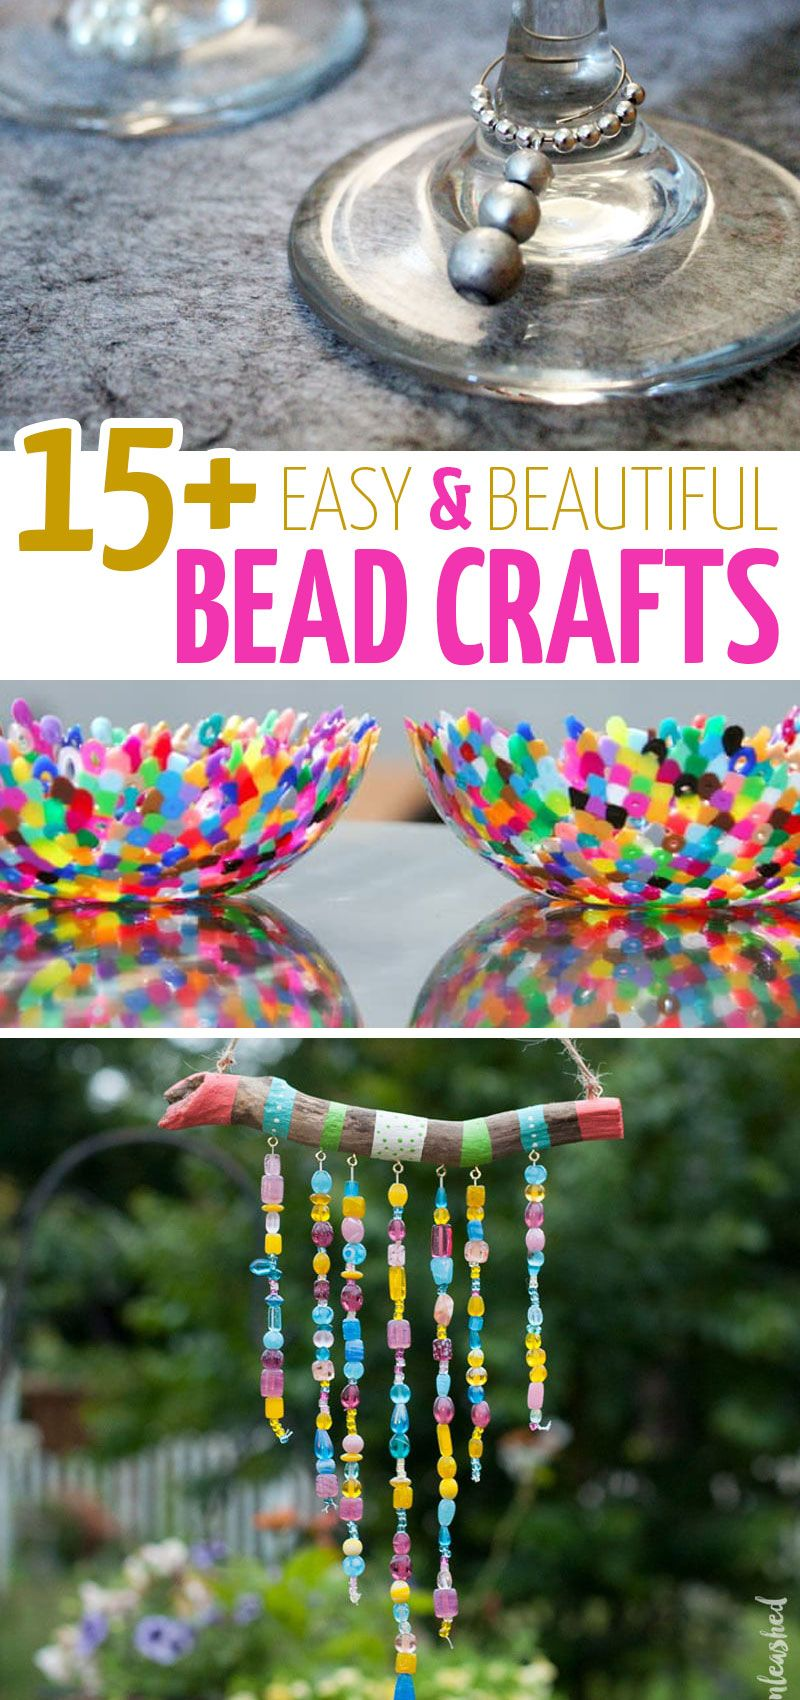 17 Stash Busting Bead Crafts Bead Crafts Diy Arts And Crafts For Kids Arts And Crafts For Teens